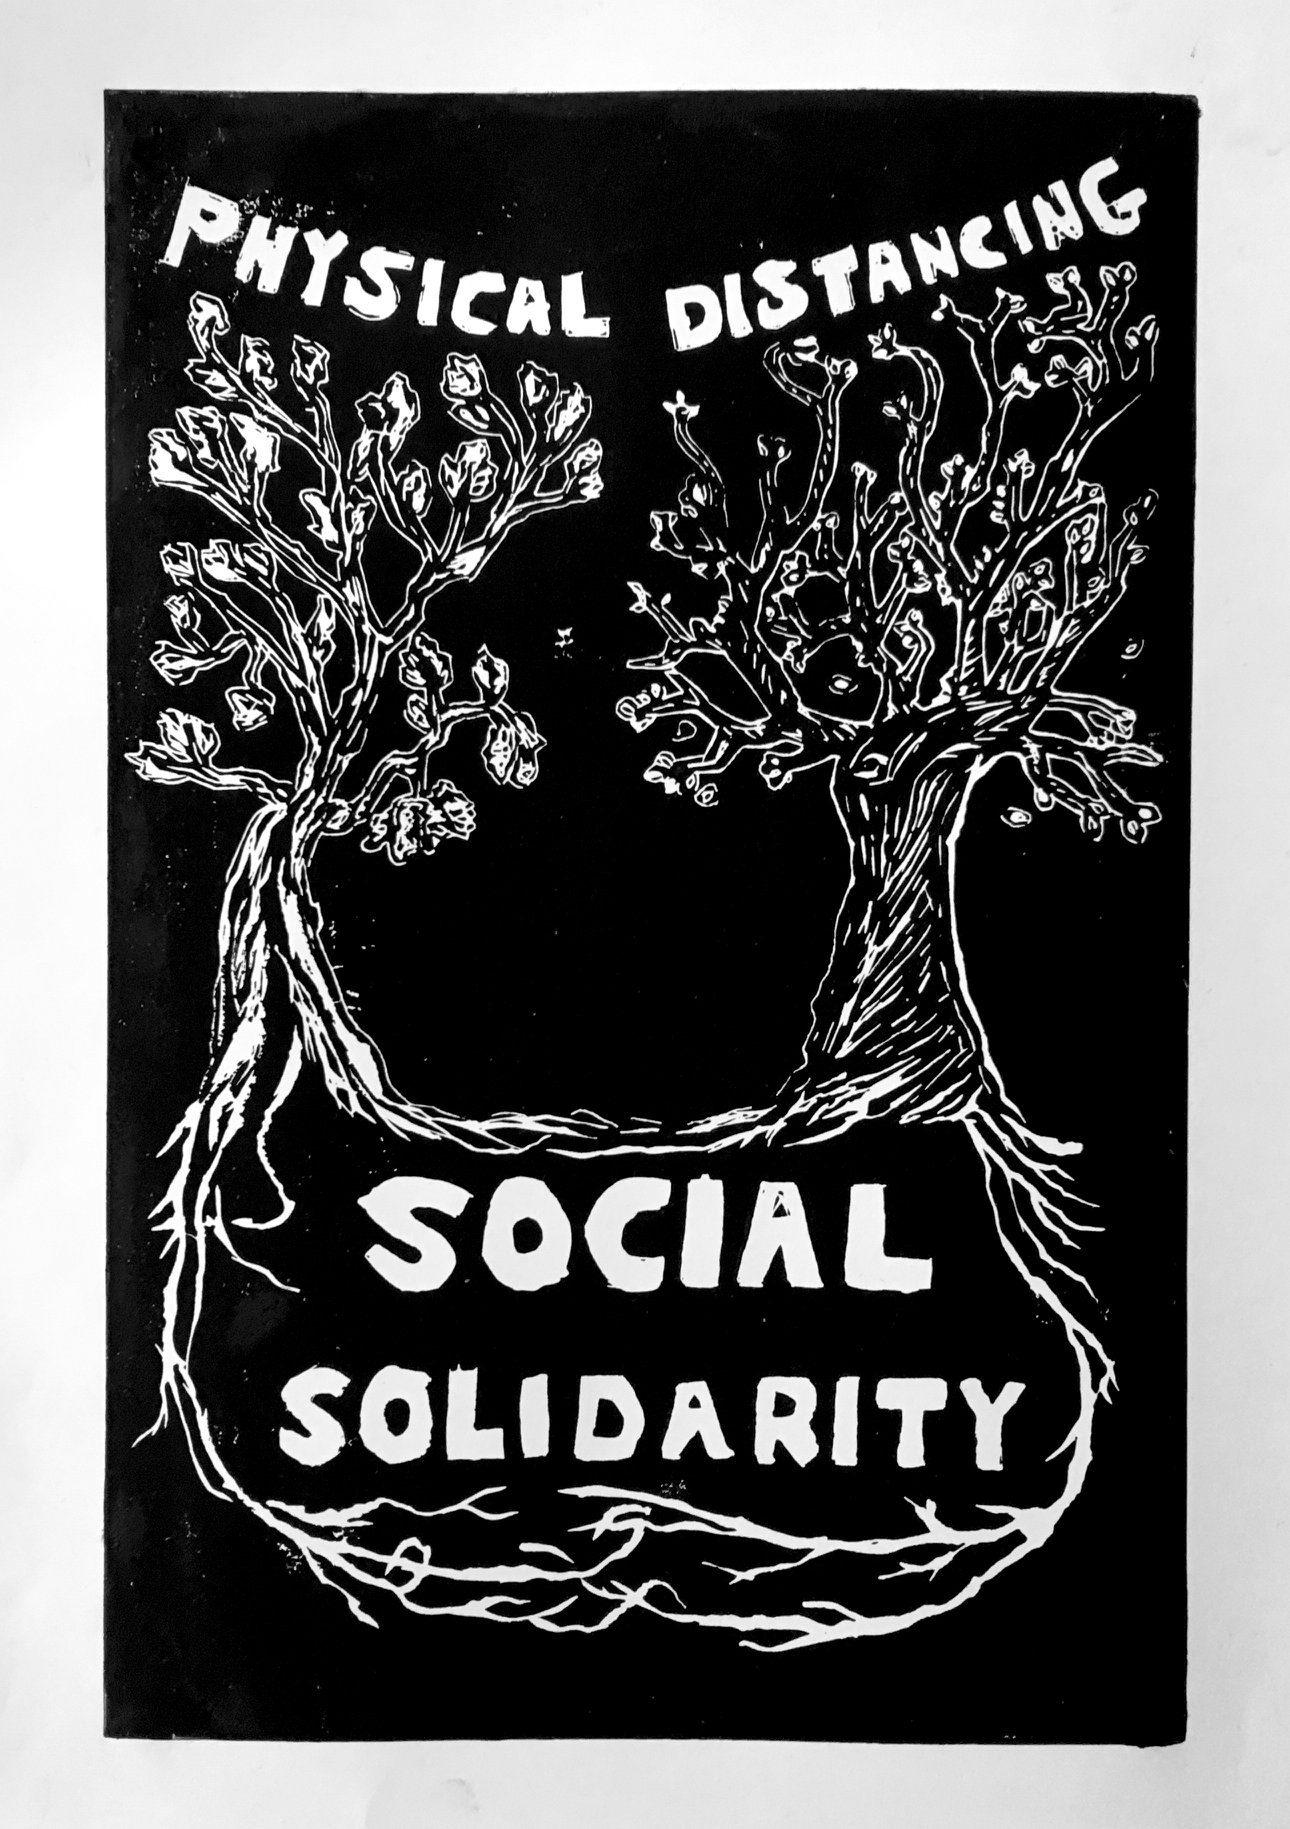 Linocut Tara Weinberg Physical Distancing Social Solidarity